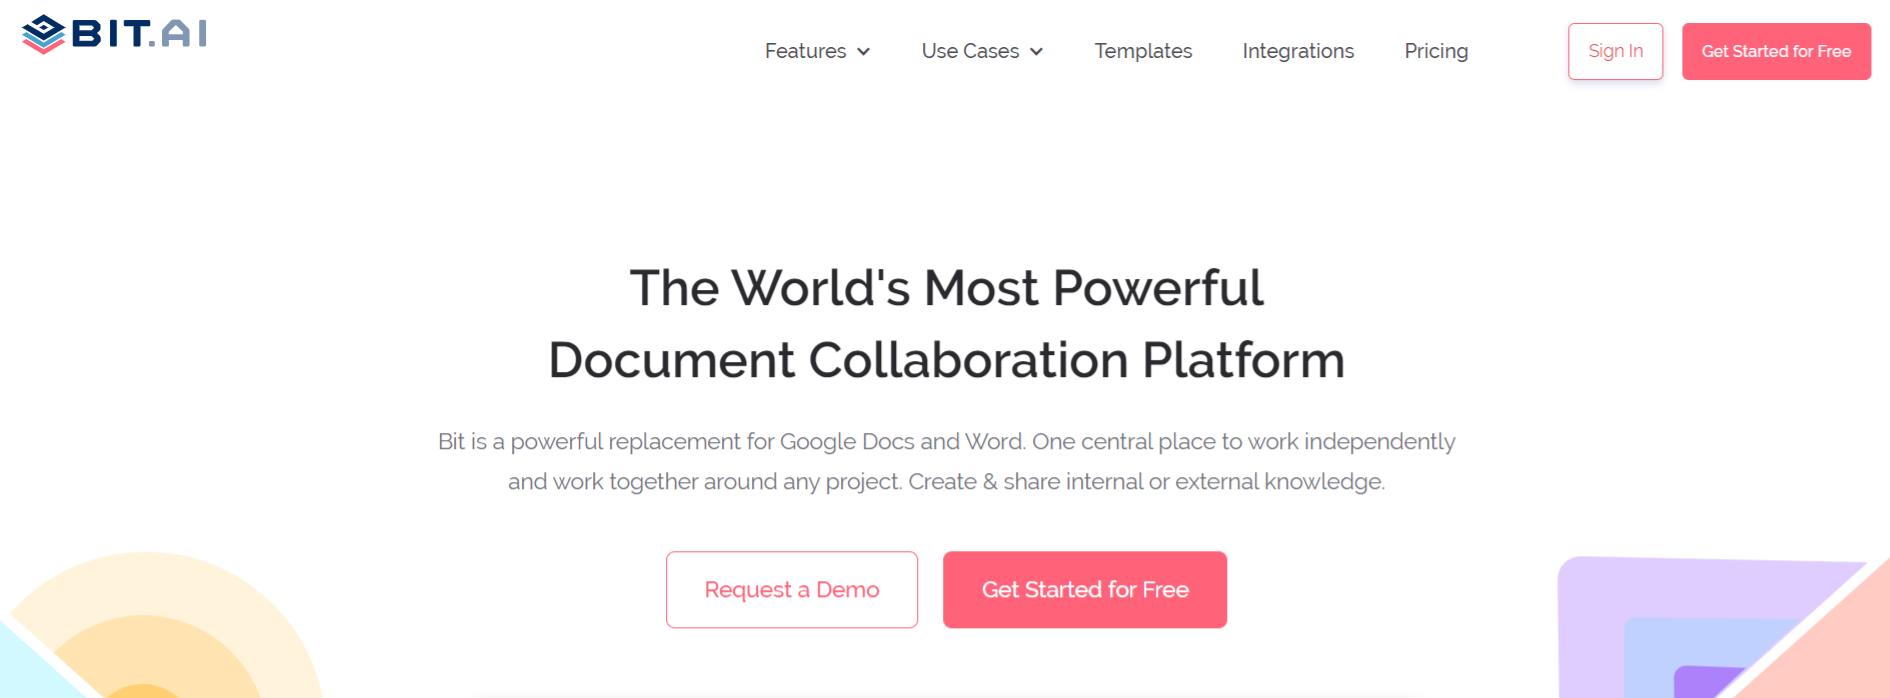 Bit.ai tool for documentation